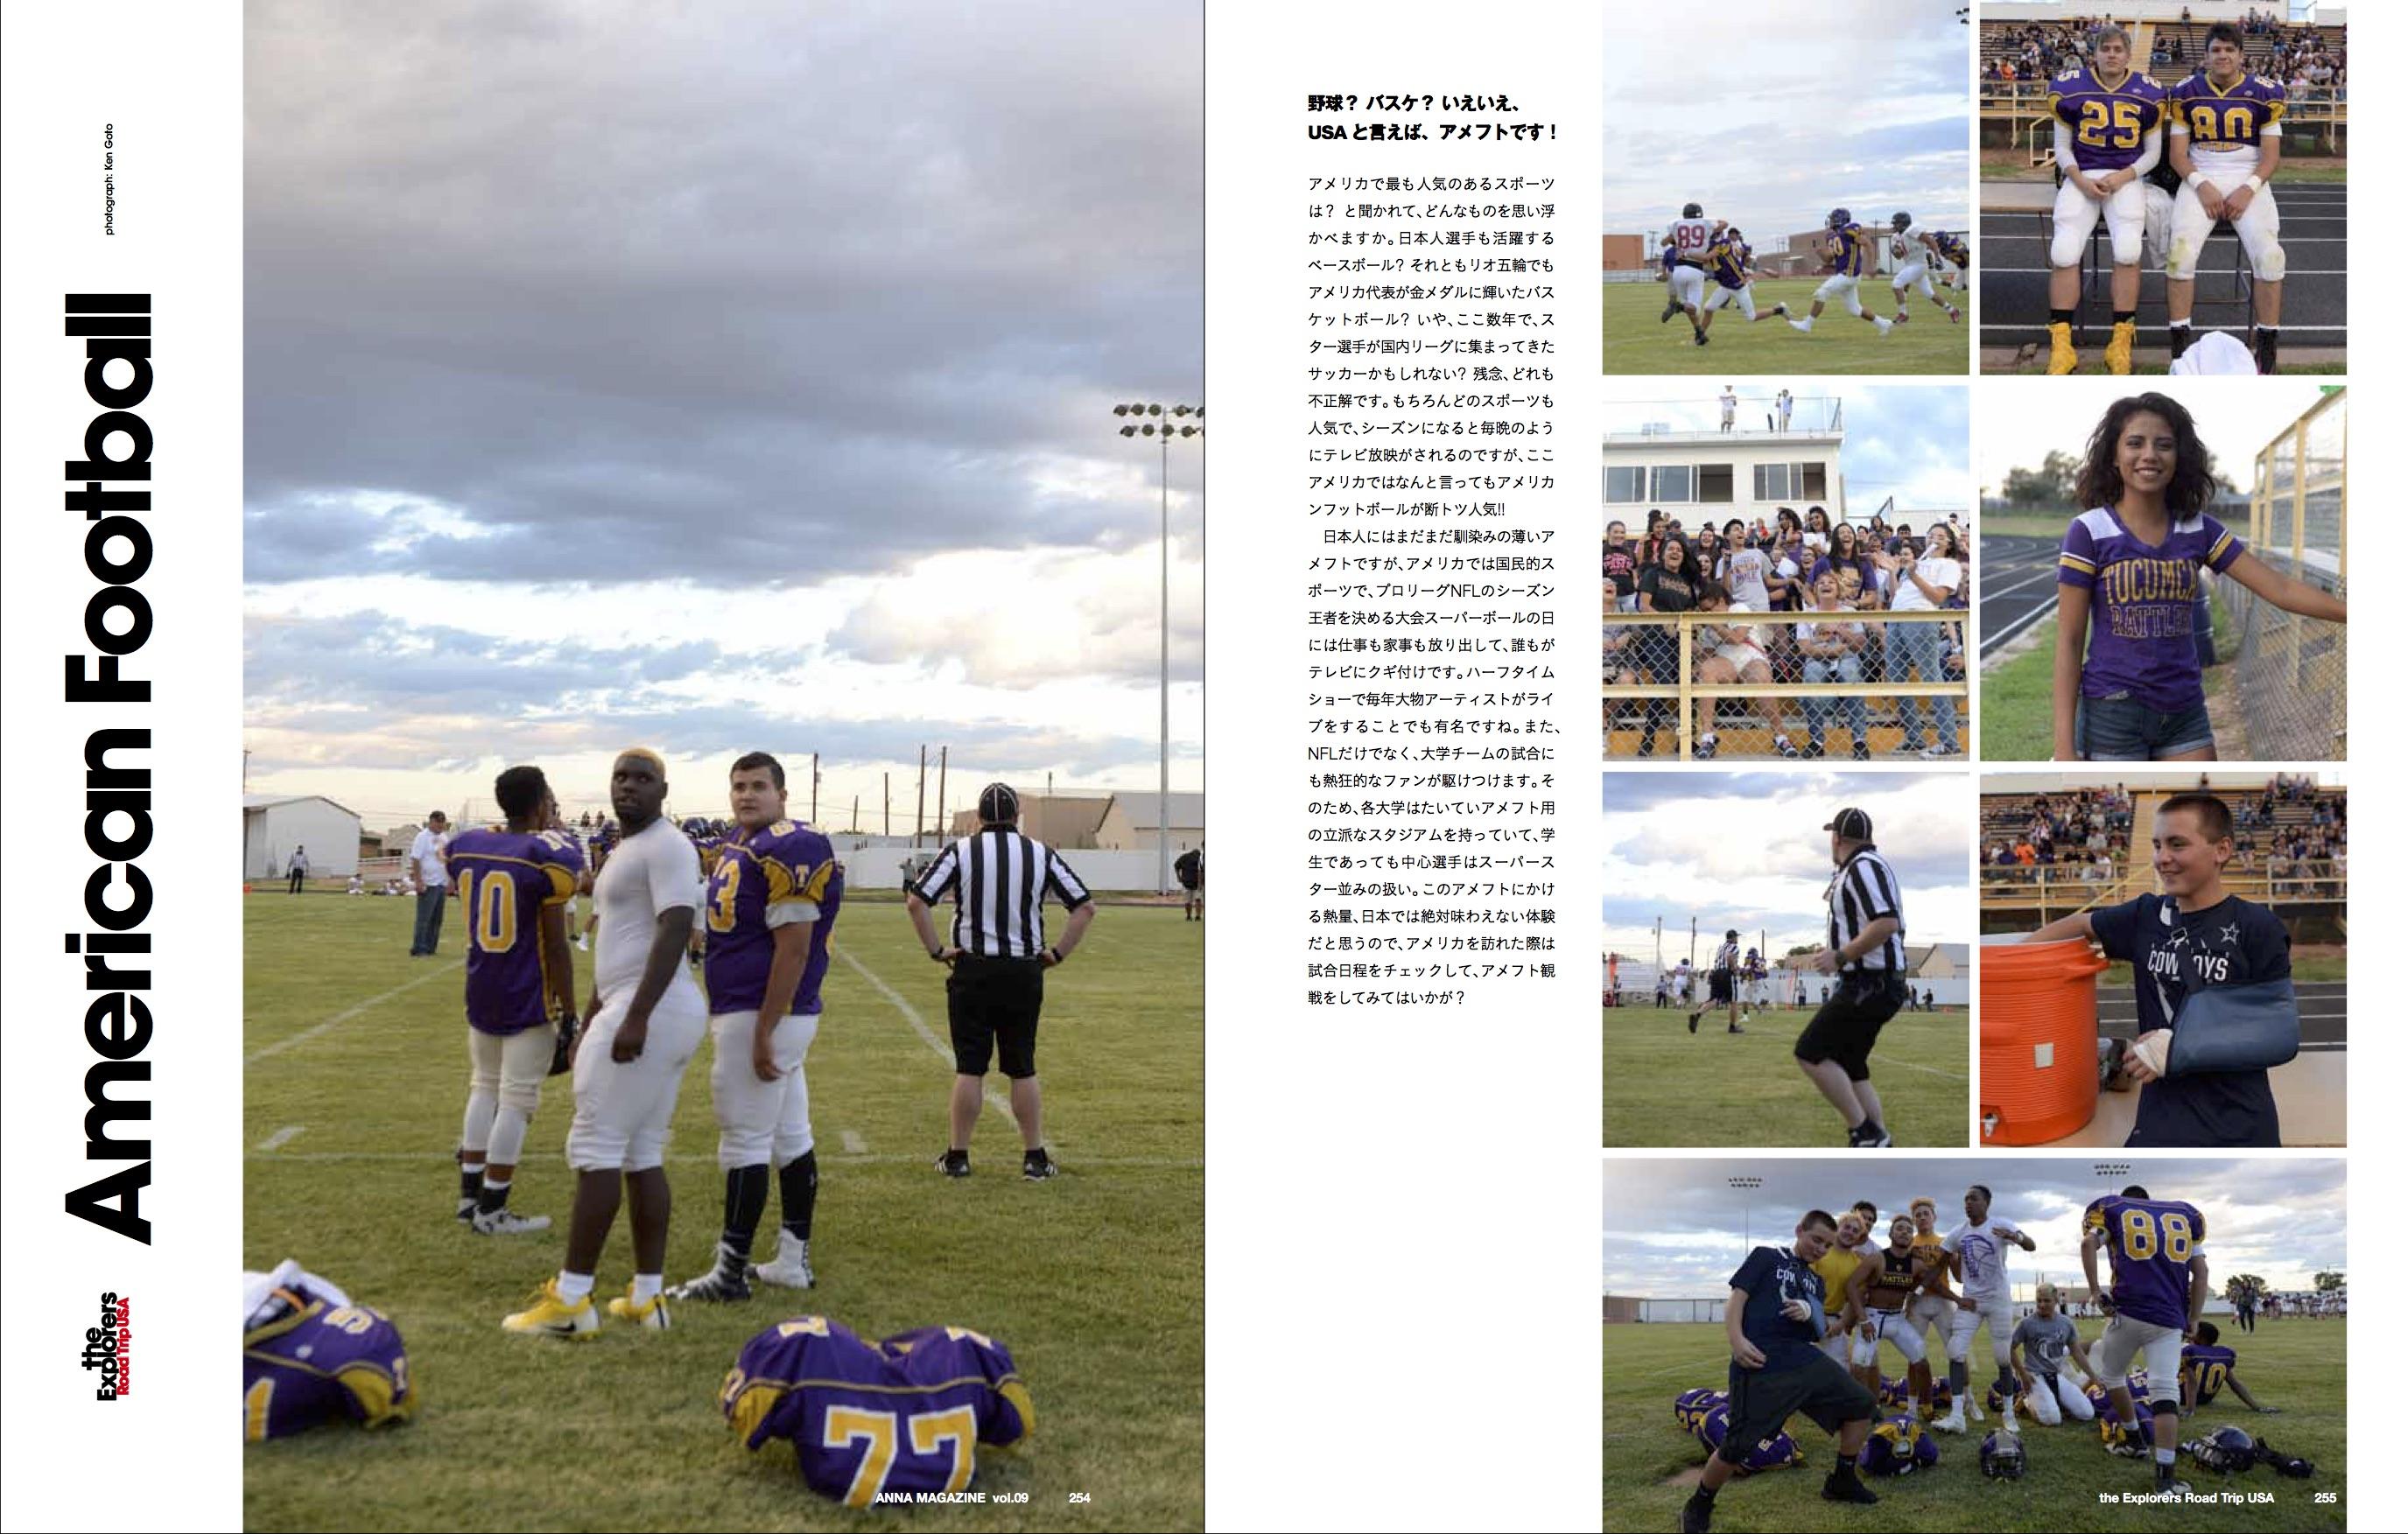 anna magazine vol.9 P120